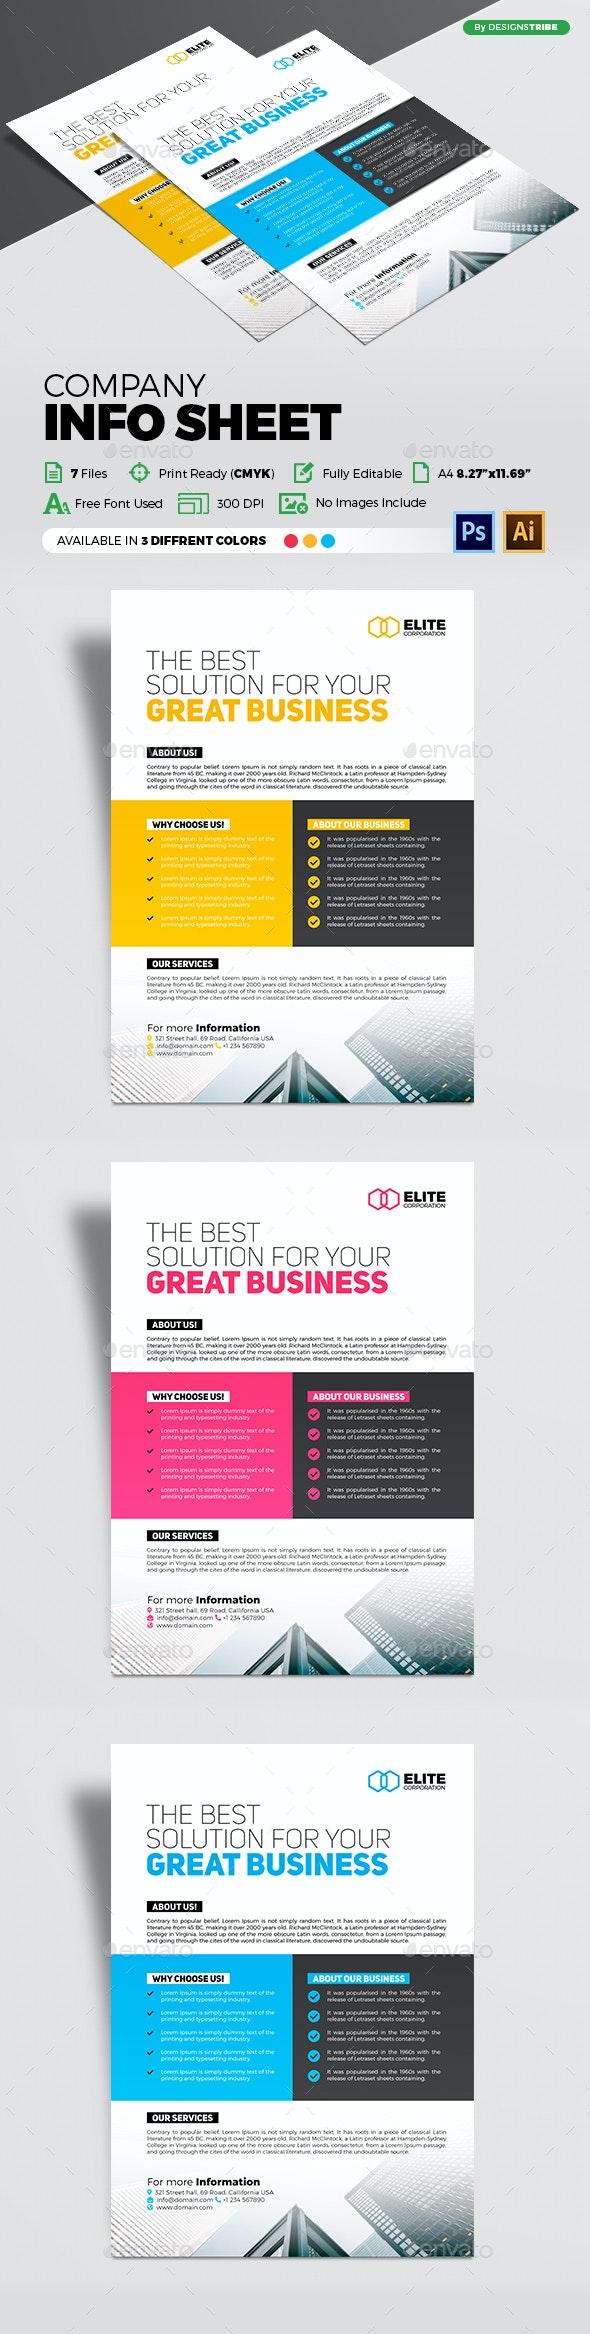 Company Info Sheet - Corporate Flyers